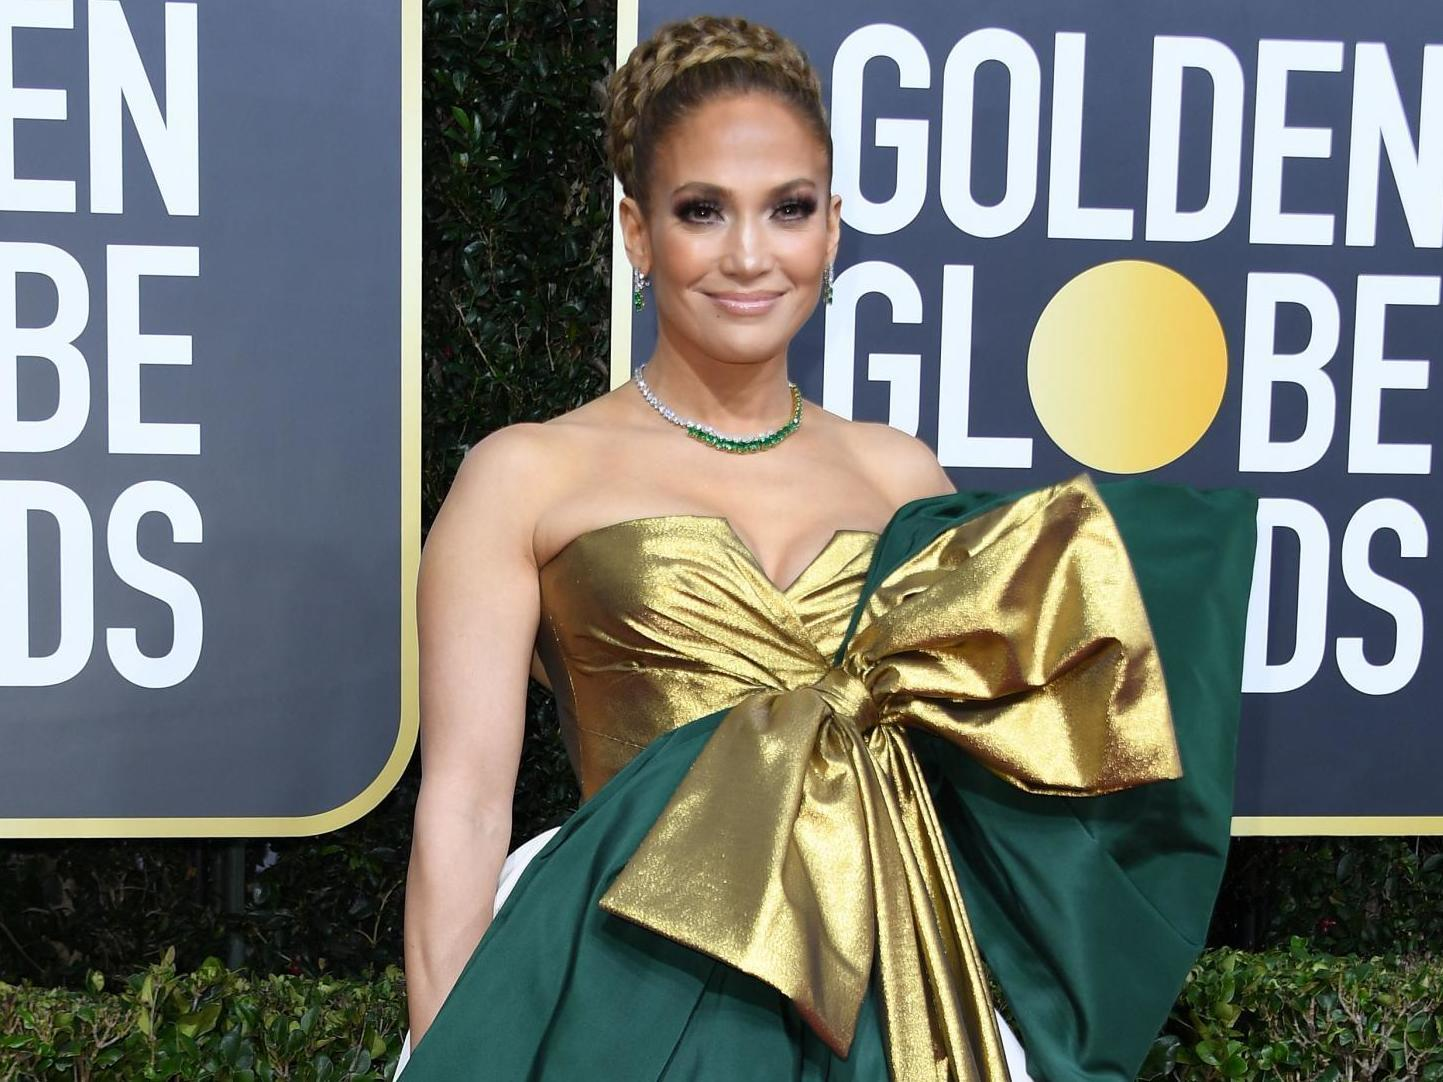 Golden Globes Jennifer Lopez S Valentino Dress Inspires Hilarious Memes On Twitter The Independent